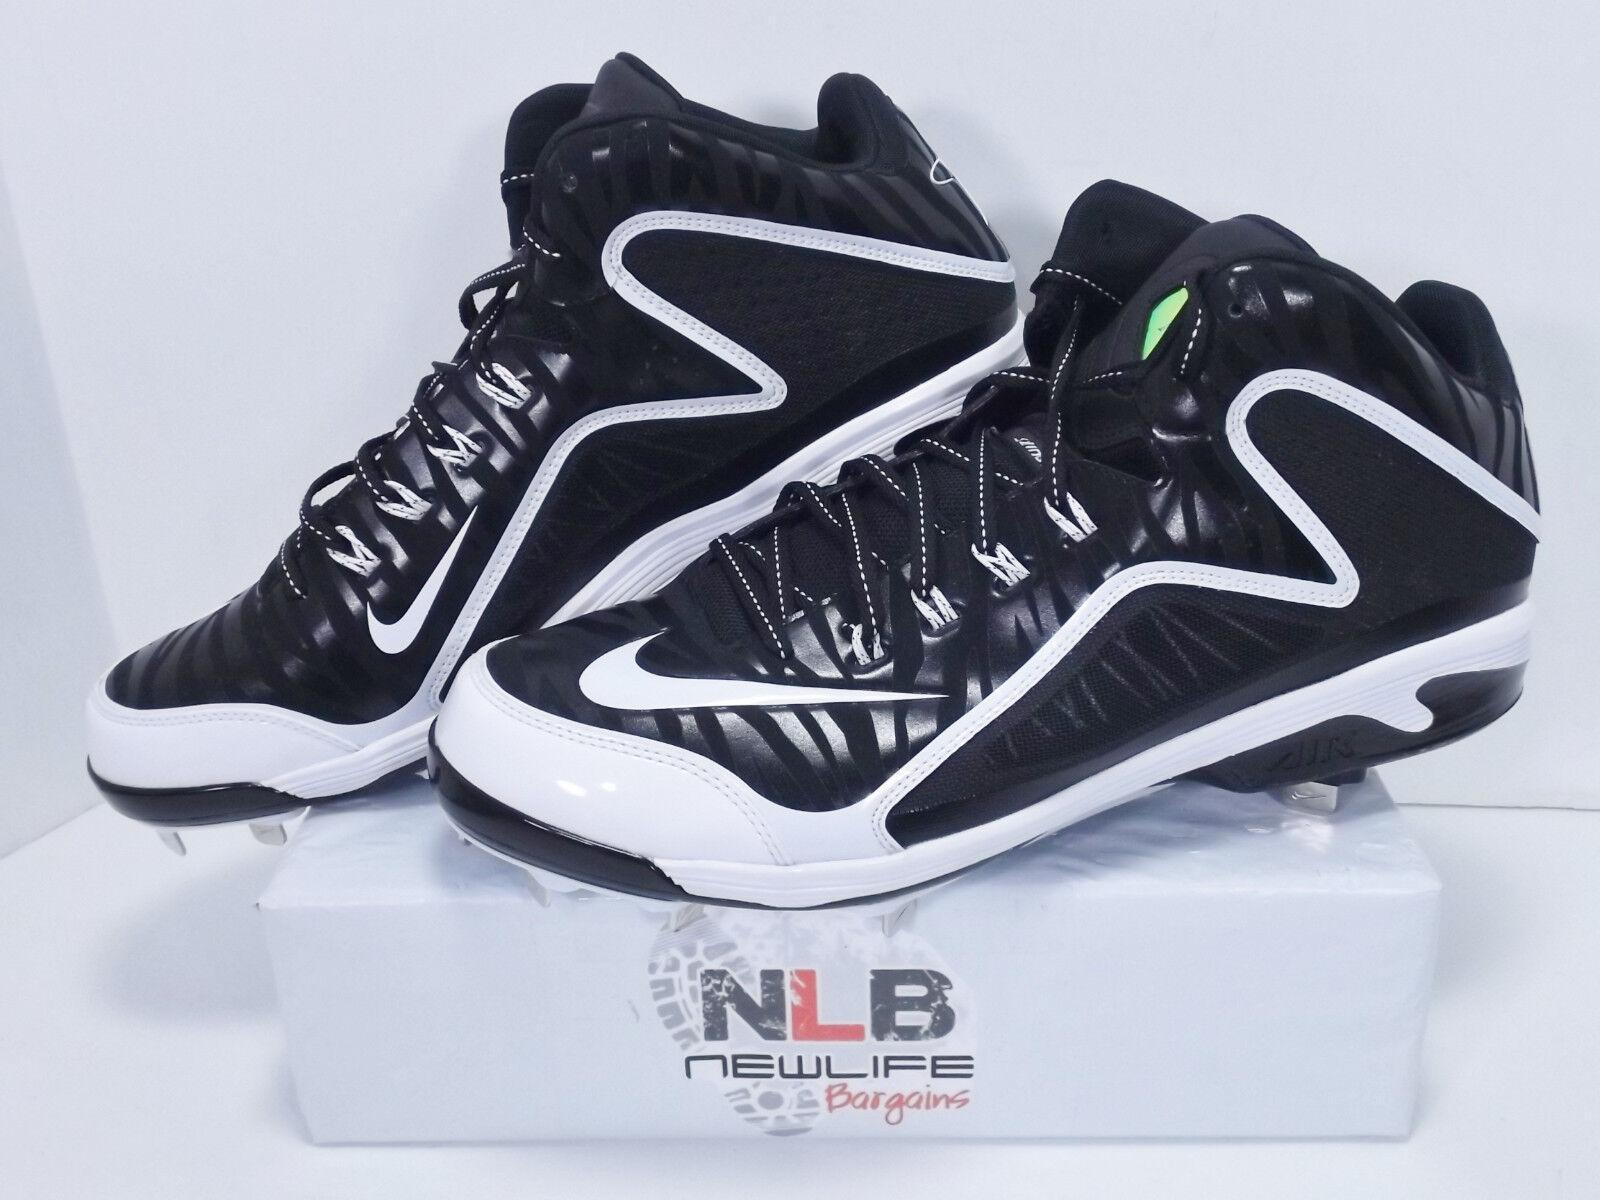 Nike air swingman mvp 2 nero     bianco 616258-001 uomo numero 14 | Diversi stili e stili  | A Basso Costo  741650